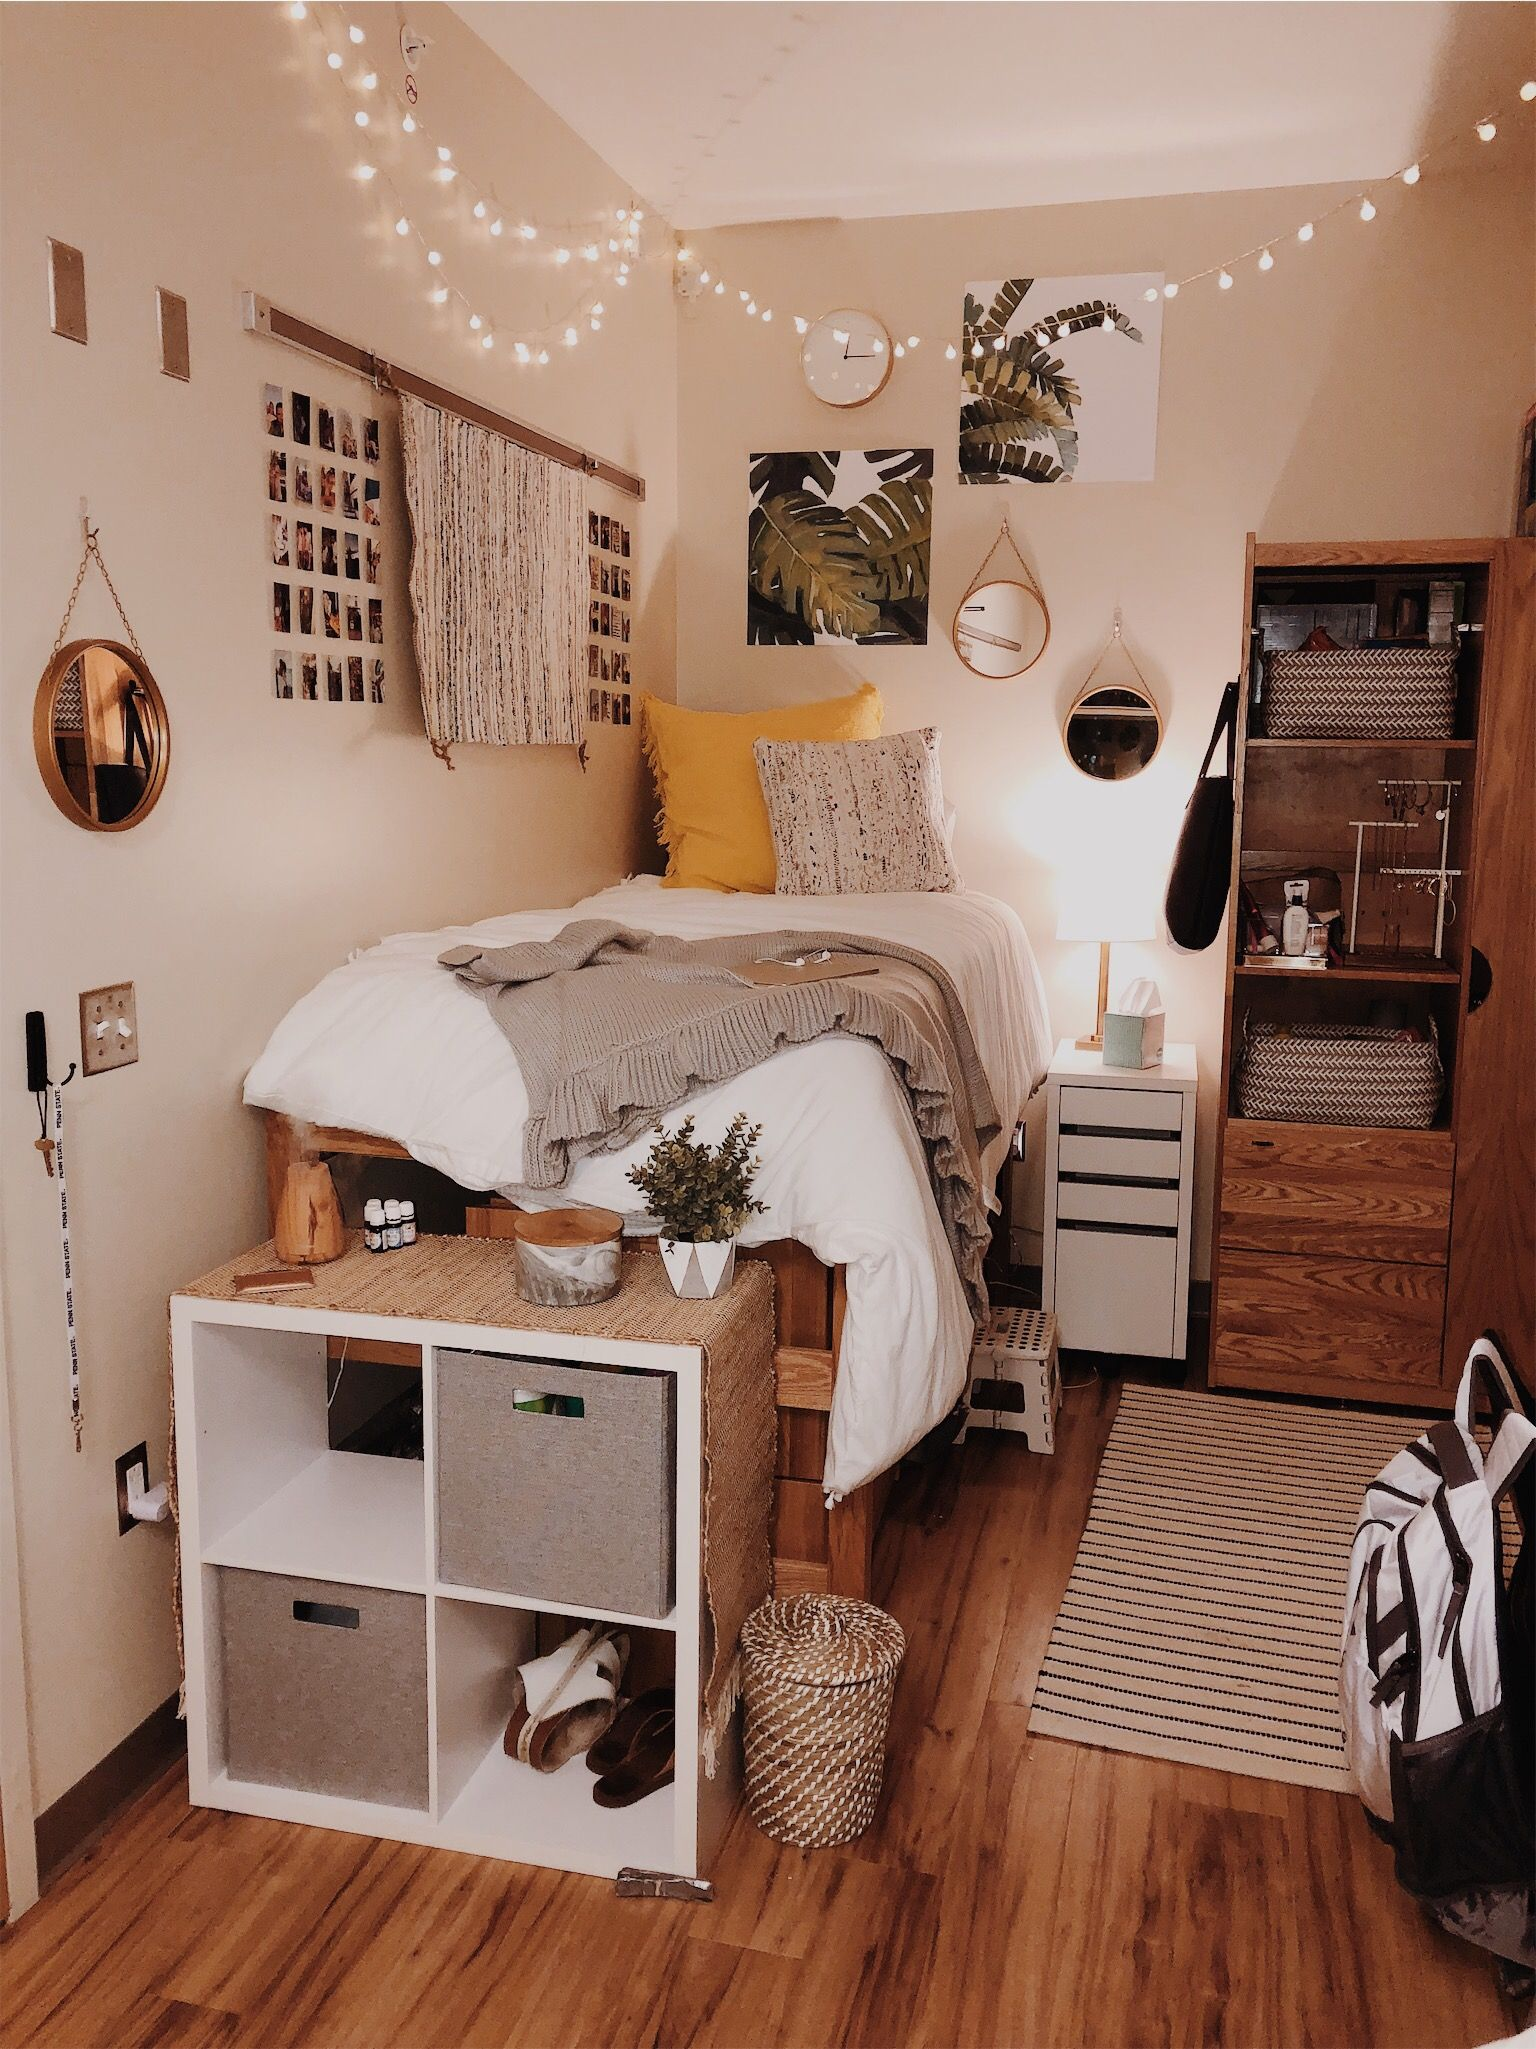 Small Dorm Room: #dormroom #roominspo #vsco #goals